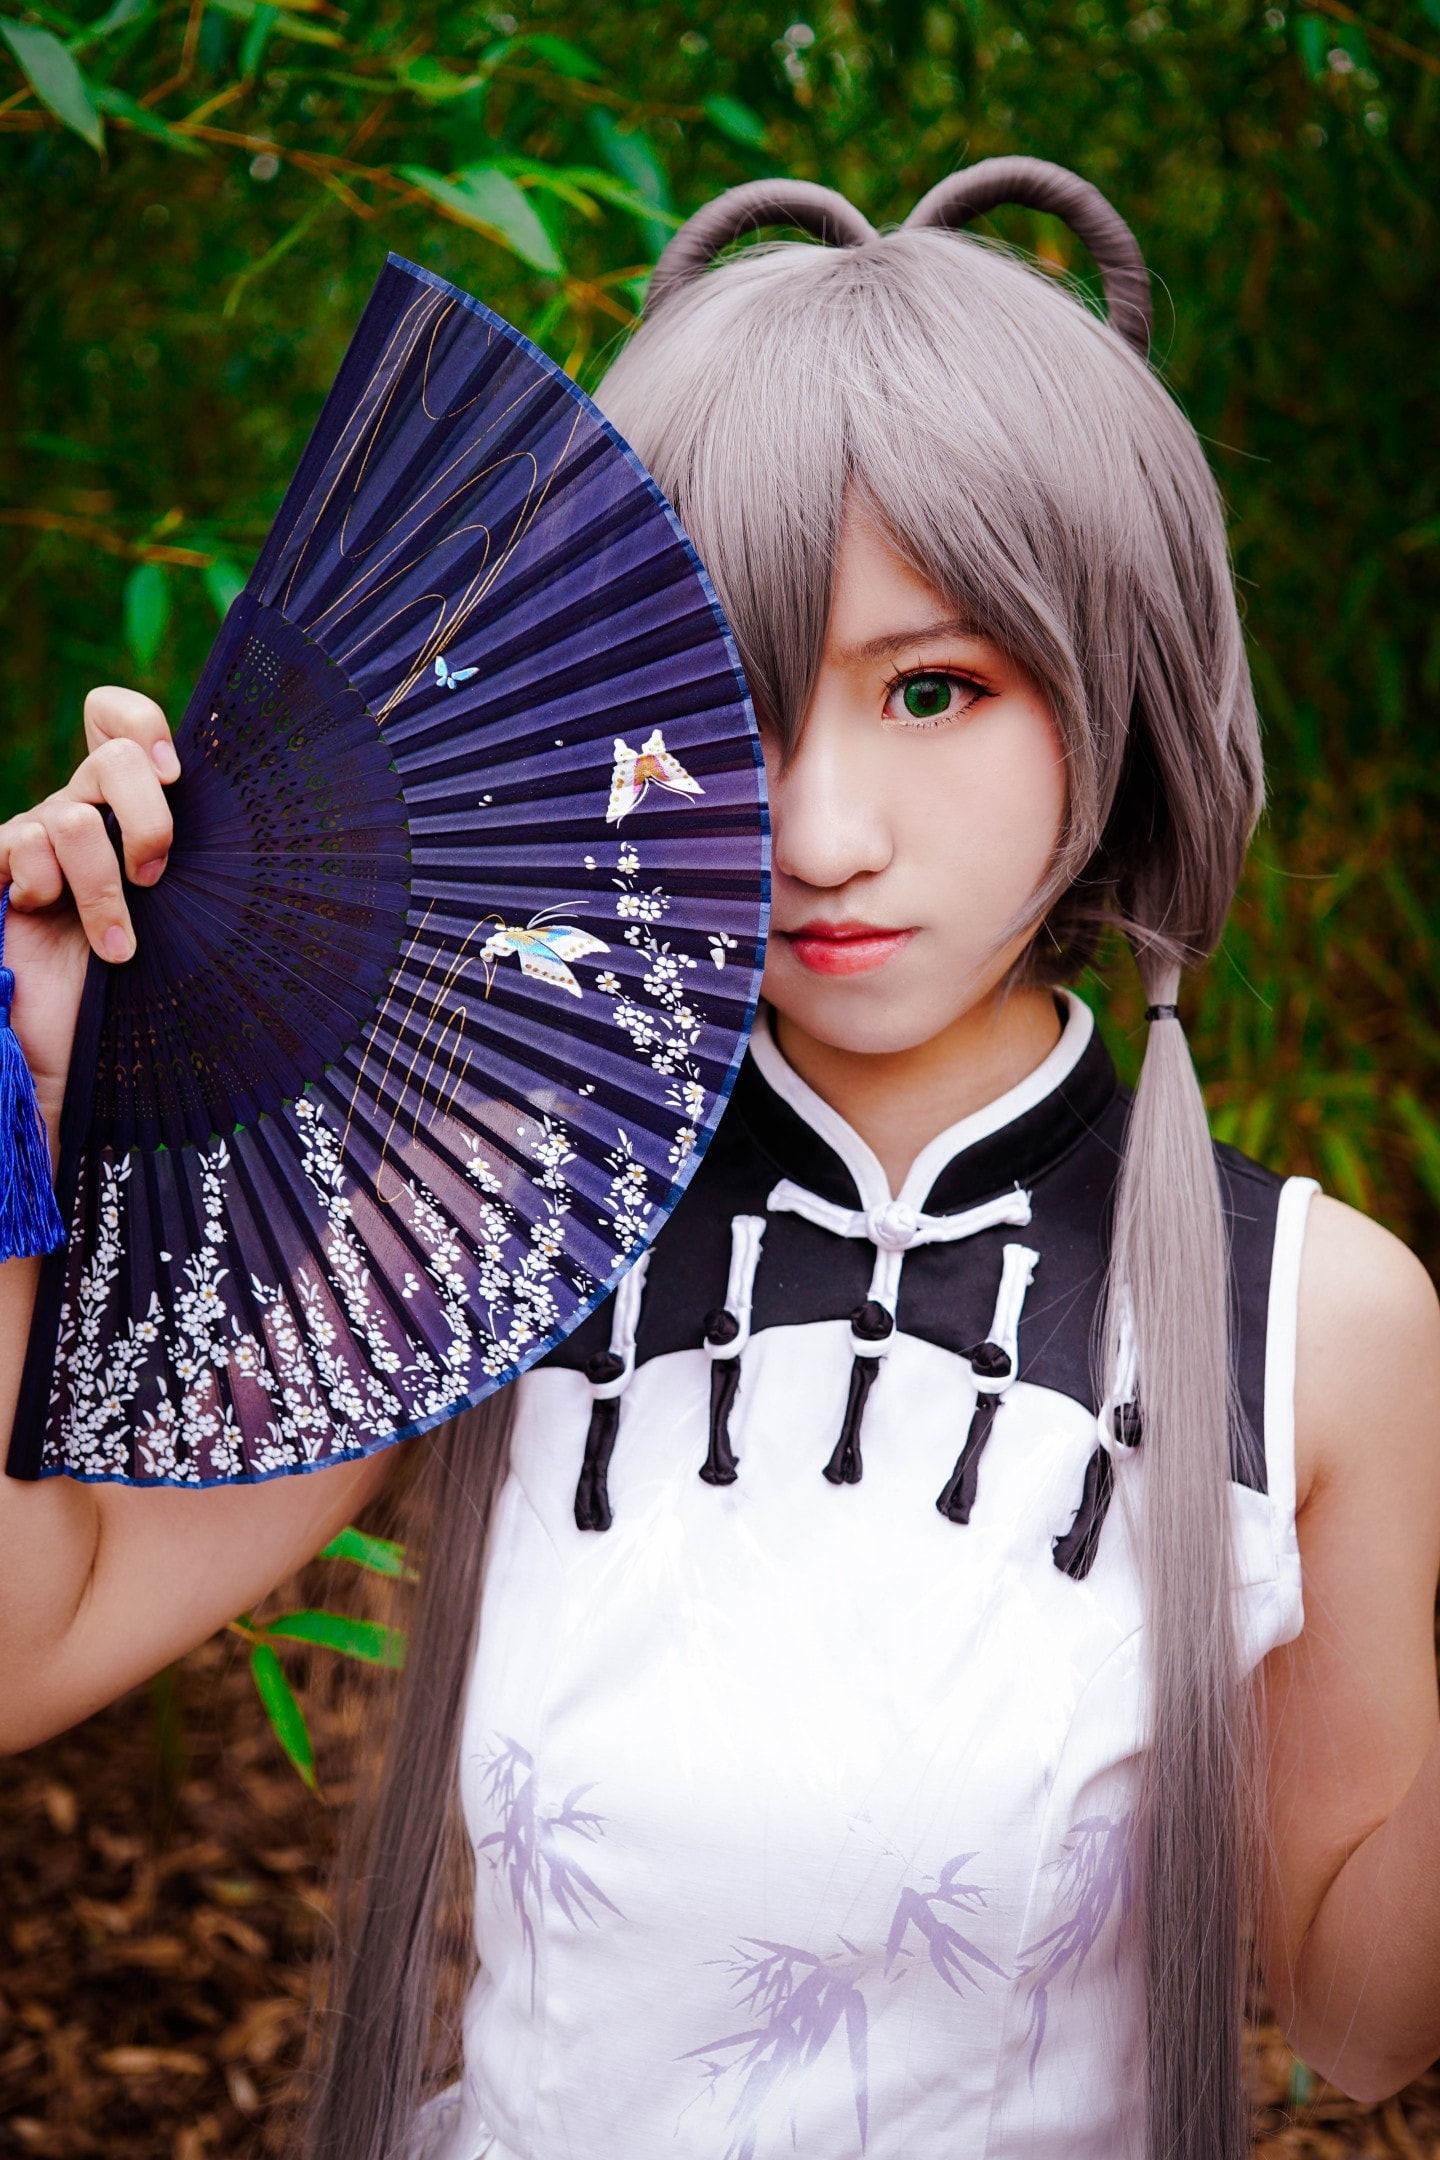 vocaloid洛天依cosplay插图(3)